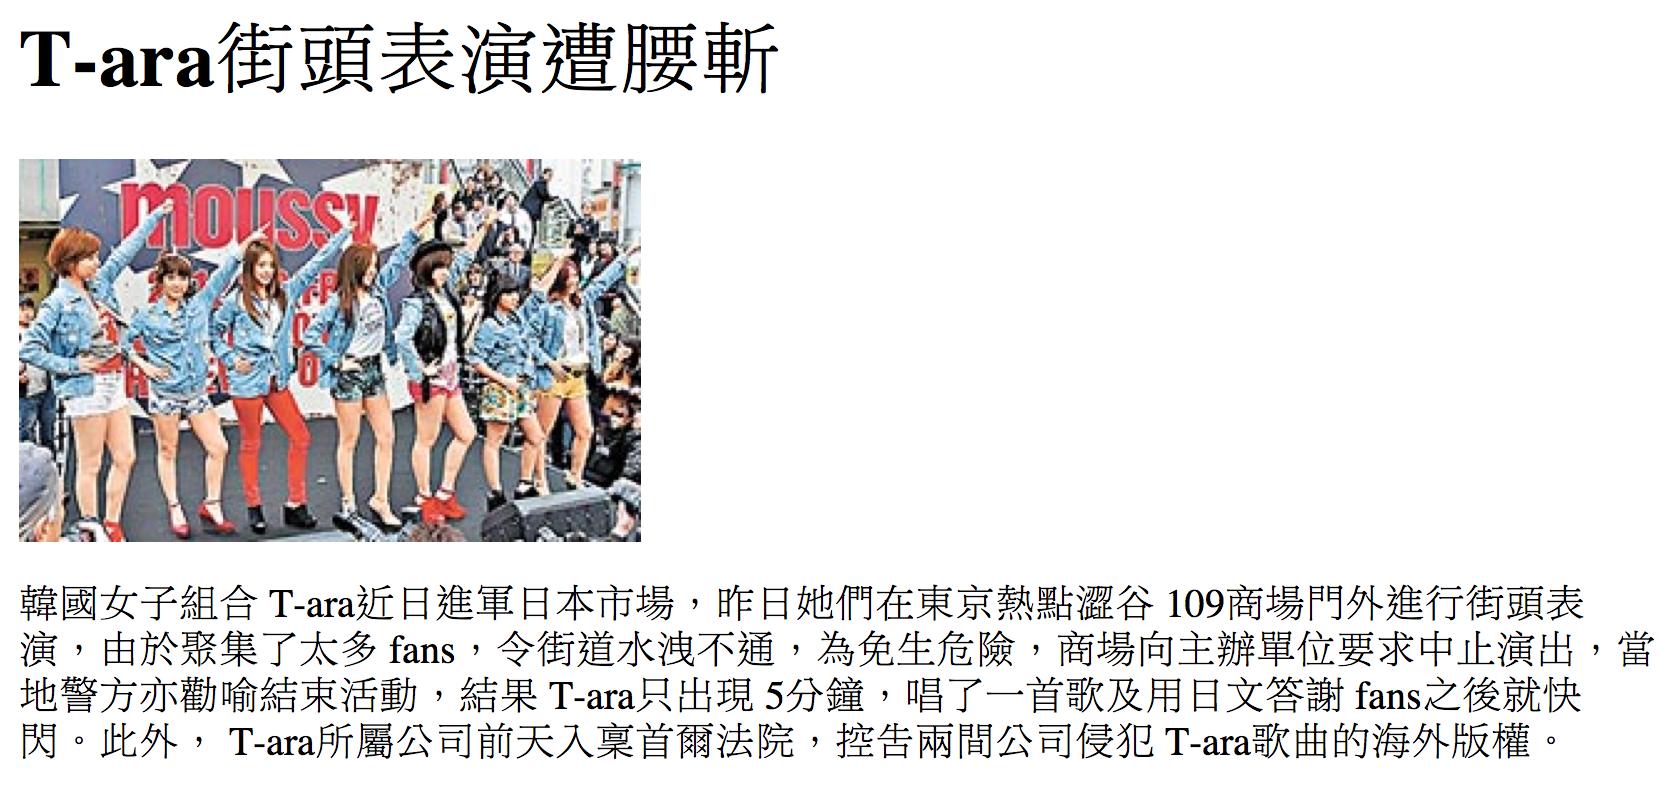 T-ara街頭表演遭腰斬